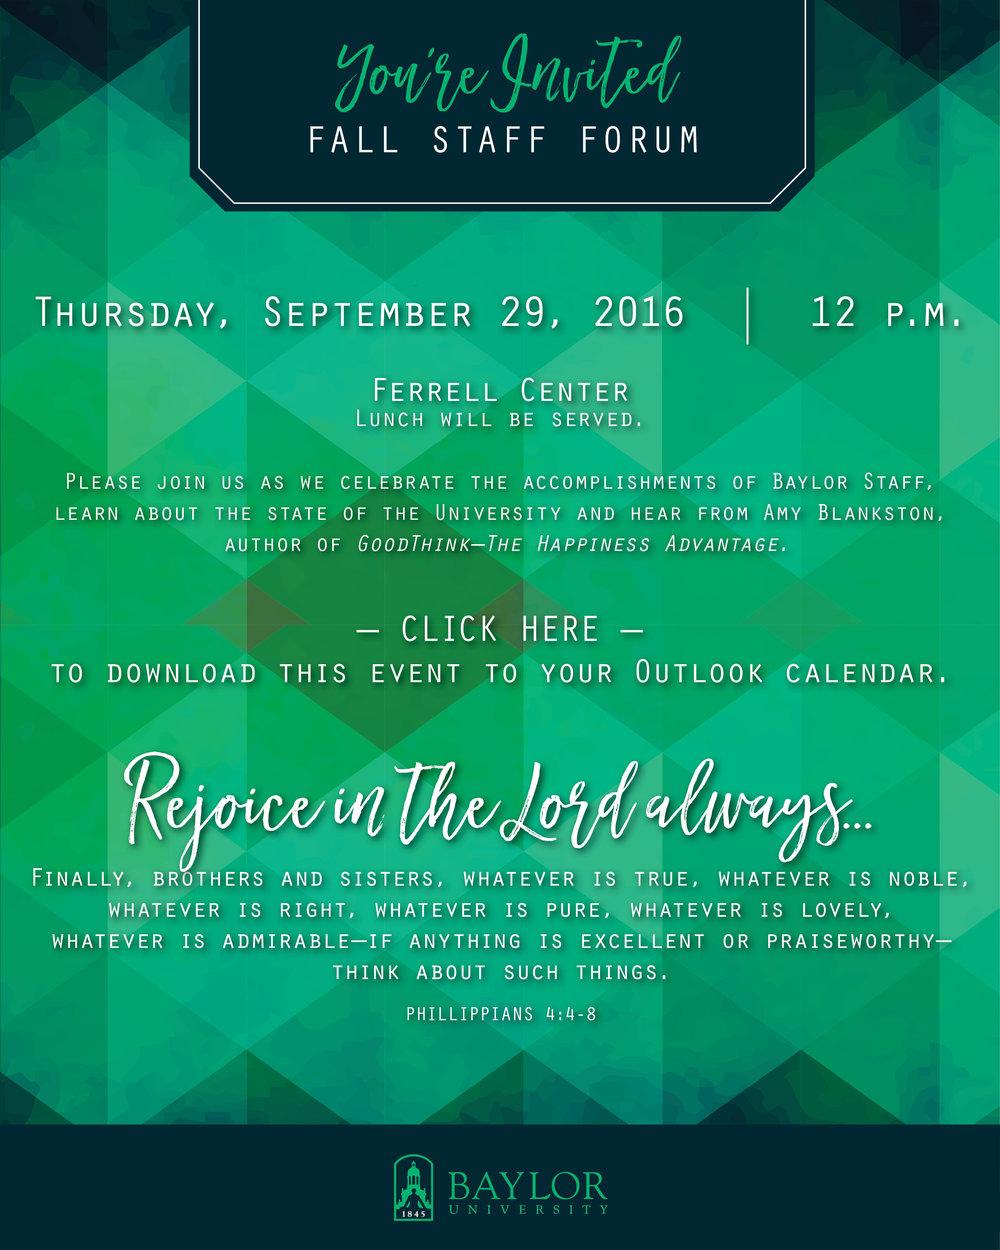 Fall.Staff.Forum.InvitationEmailDesktop2.jpg